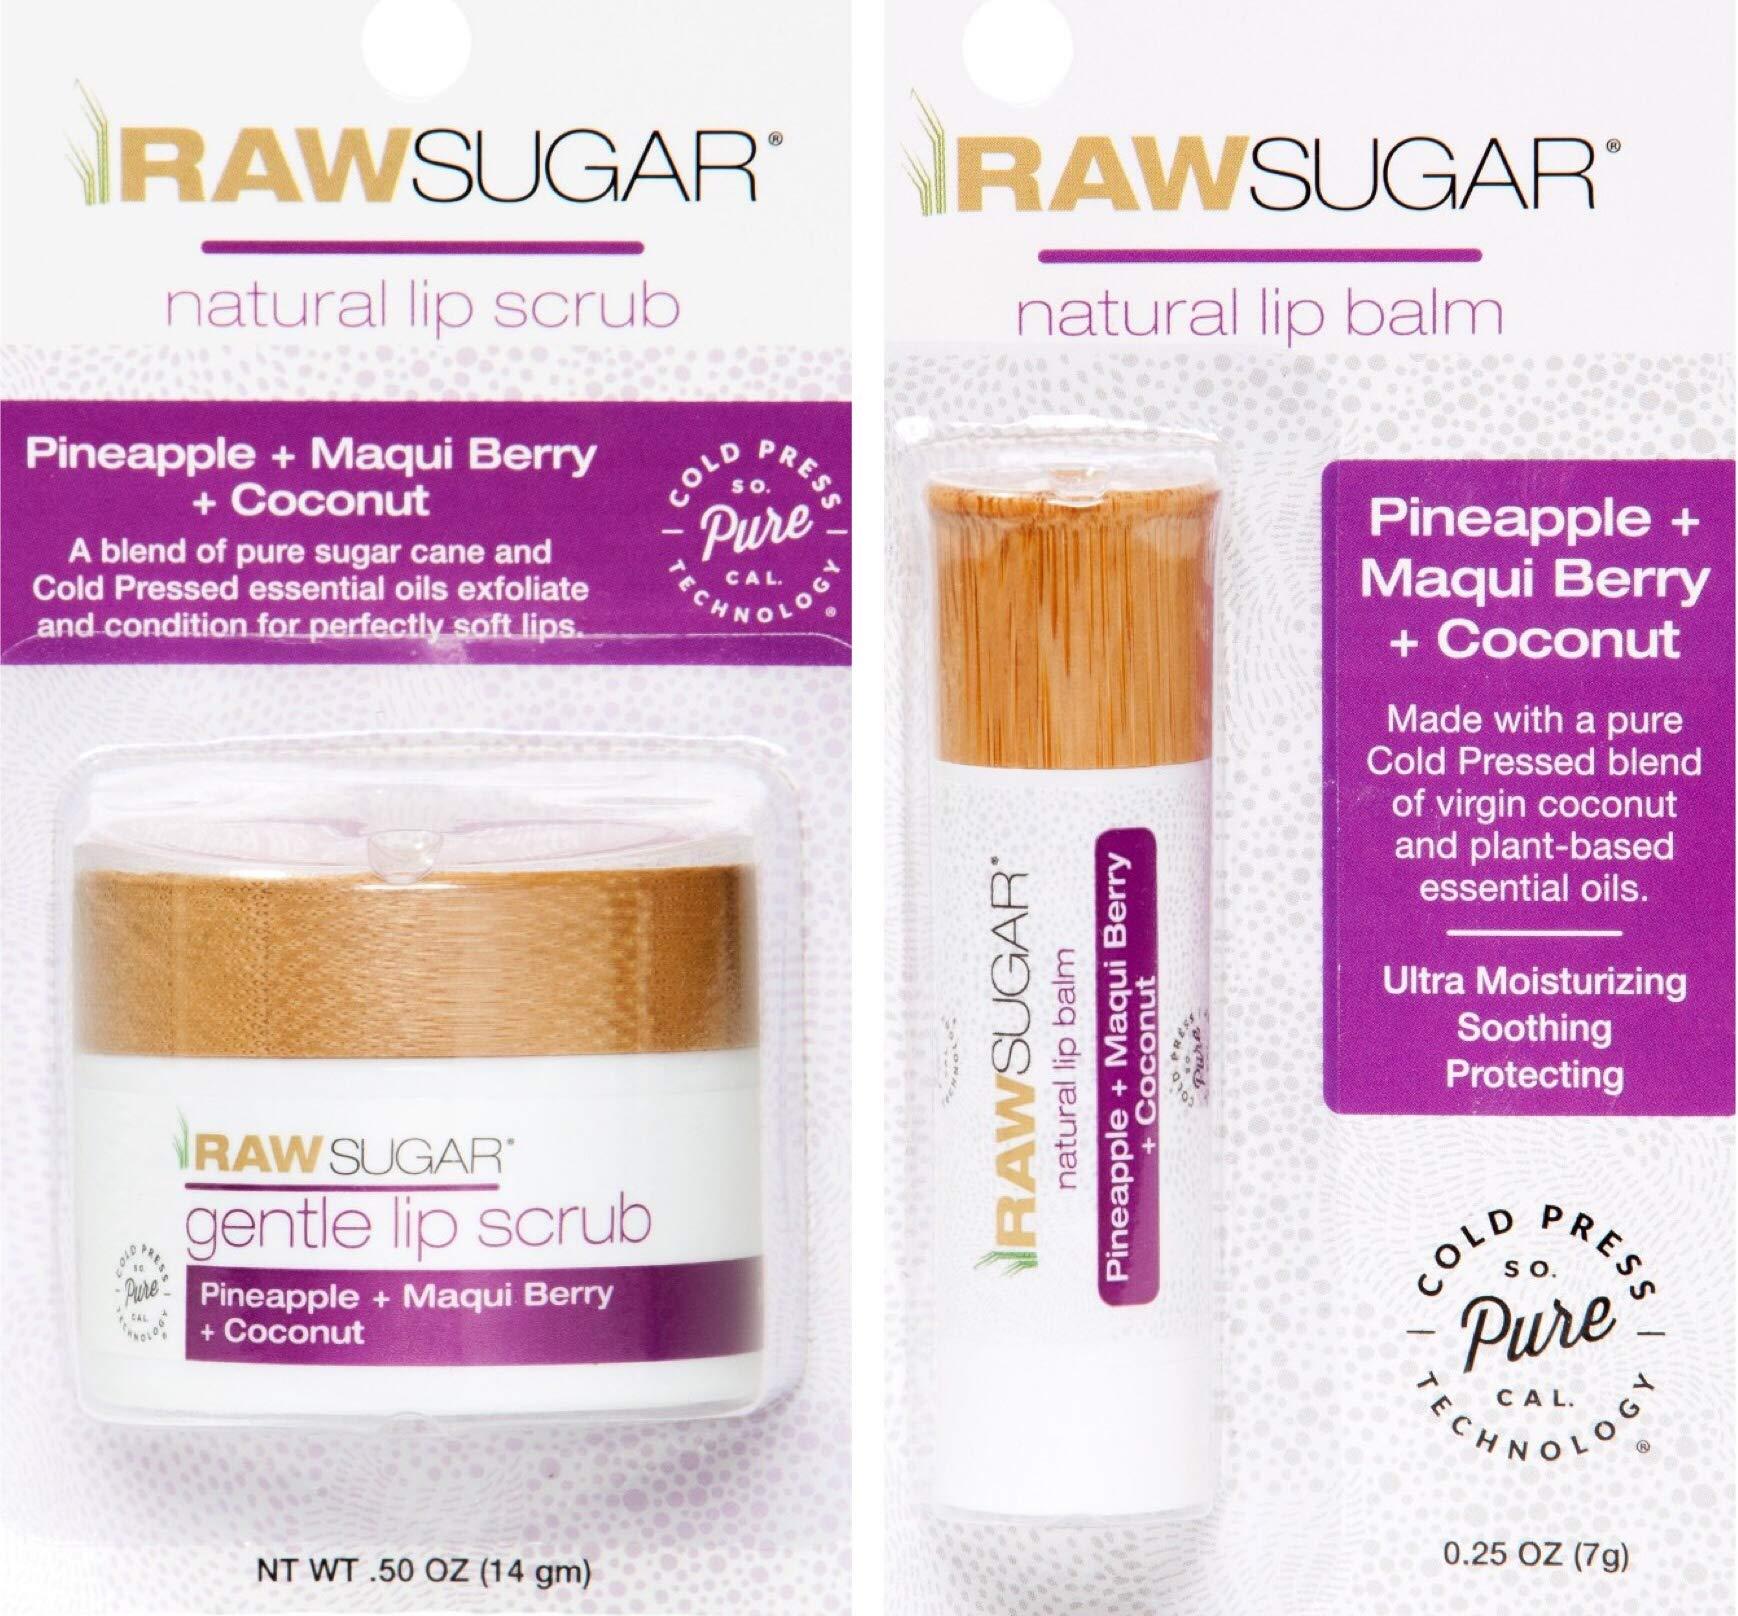 Raw Sugar Pineapple + Maqui Berry + Coconut Lip Set - .50 oz Natural Lip Scrub and .25 oz Natural Lip Balm by Sugar in the Raw